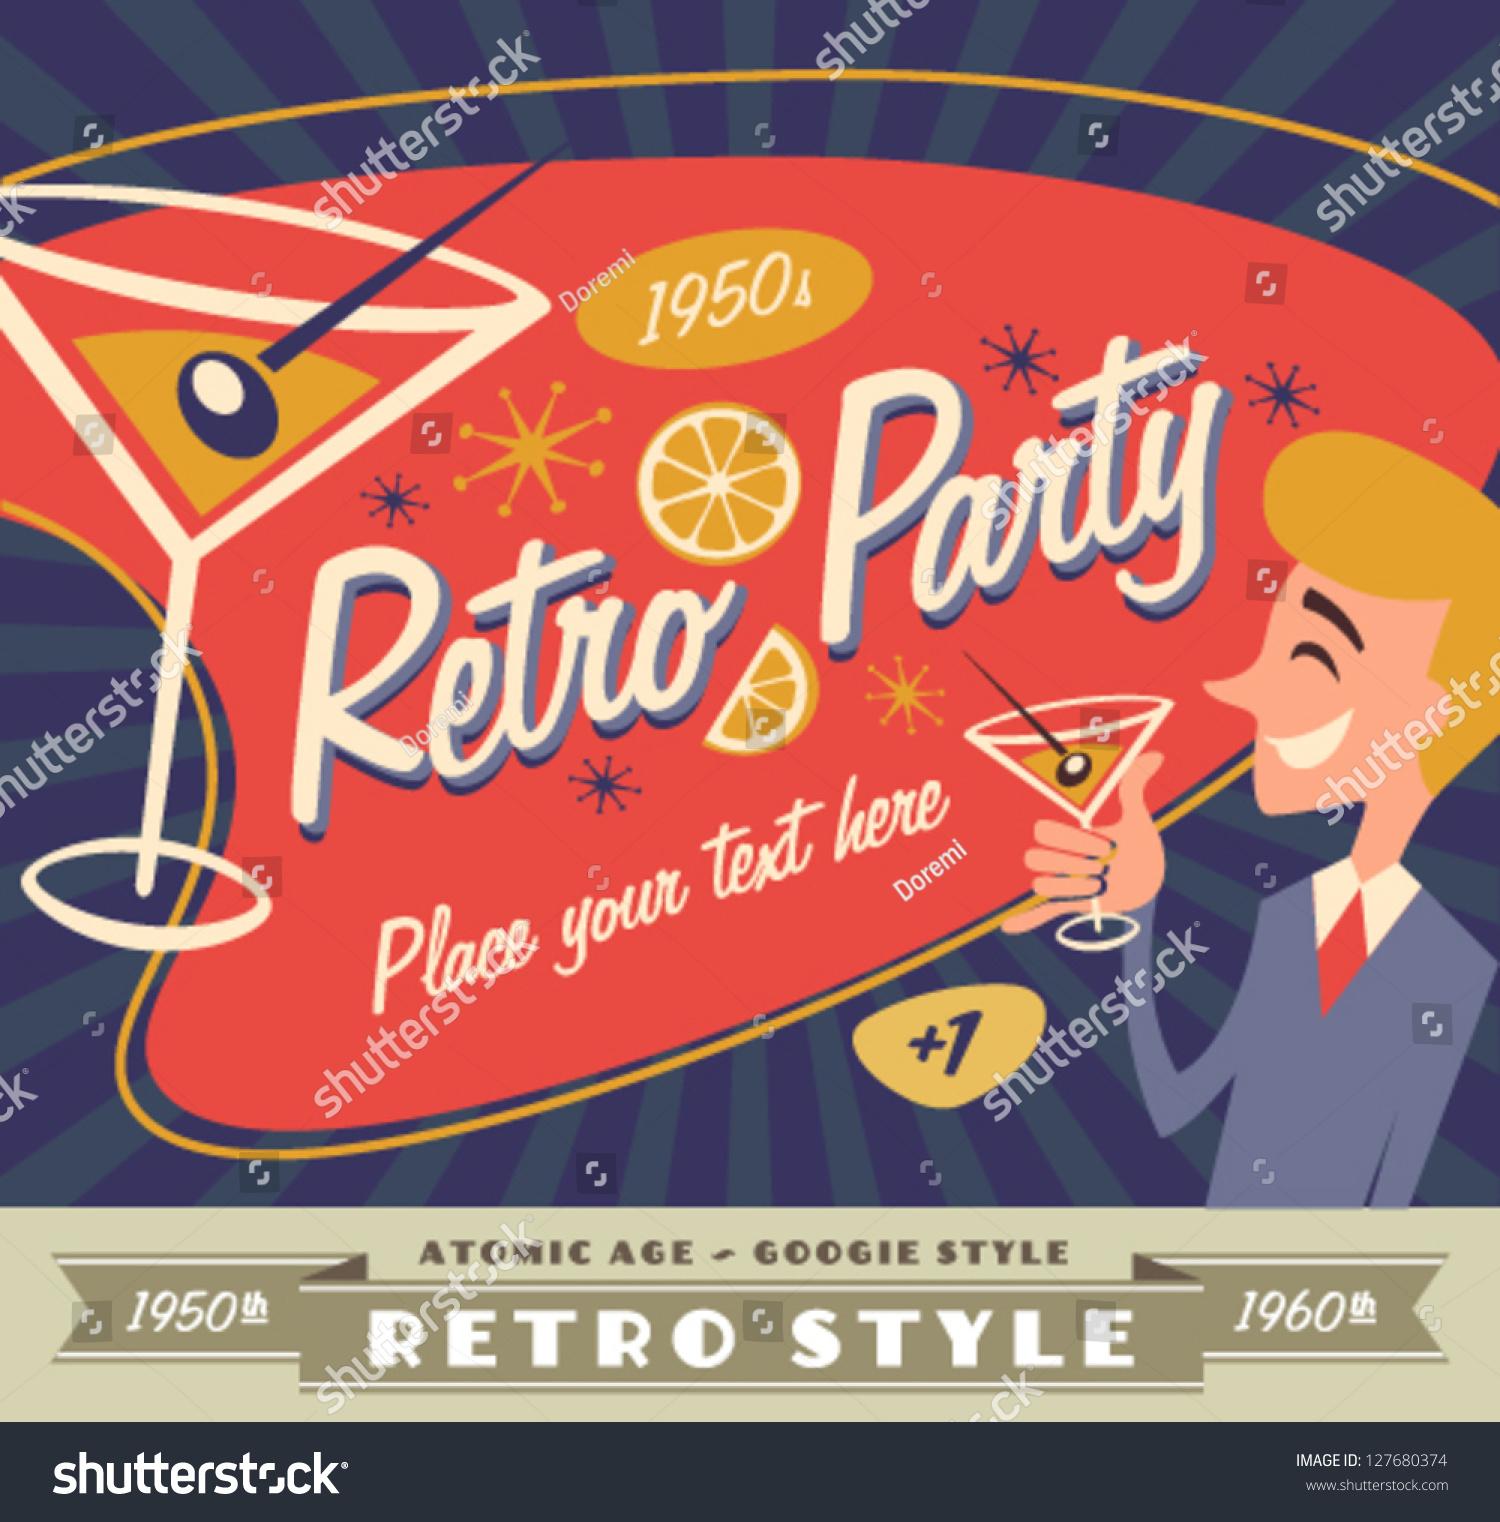 Retro Party Poster Stock Vector 127680374 - Shutterstock